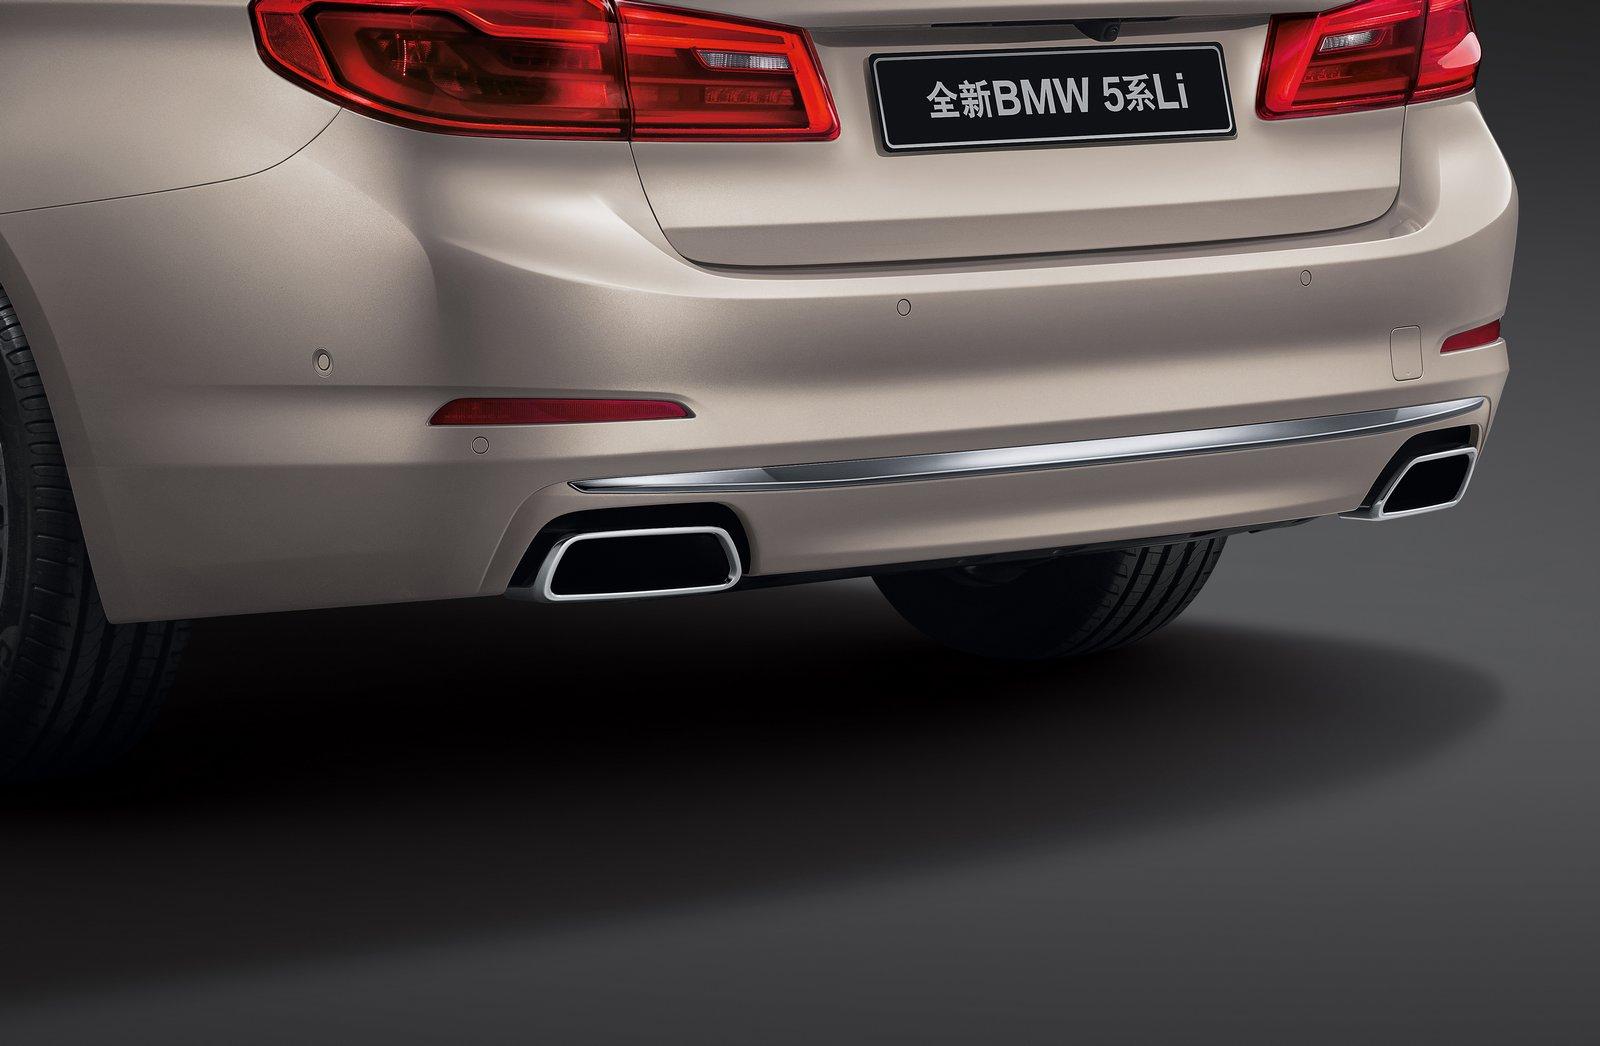 BMW-5-Series-LWB-7.jpg